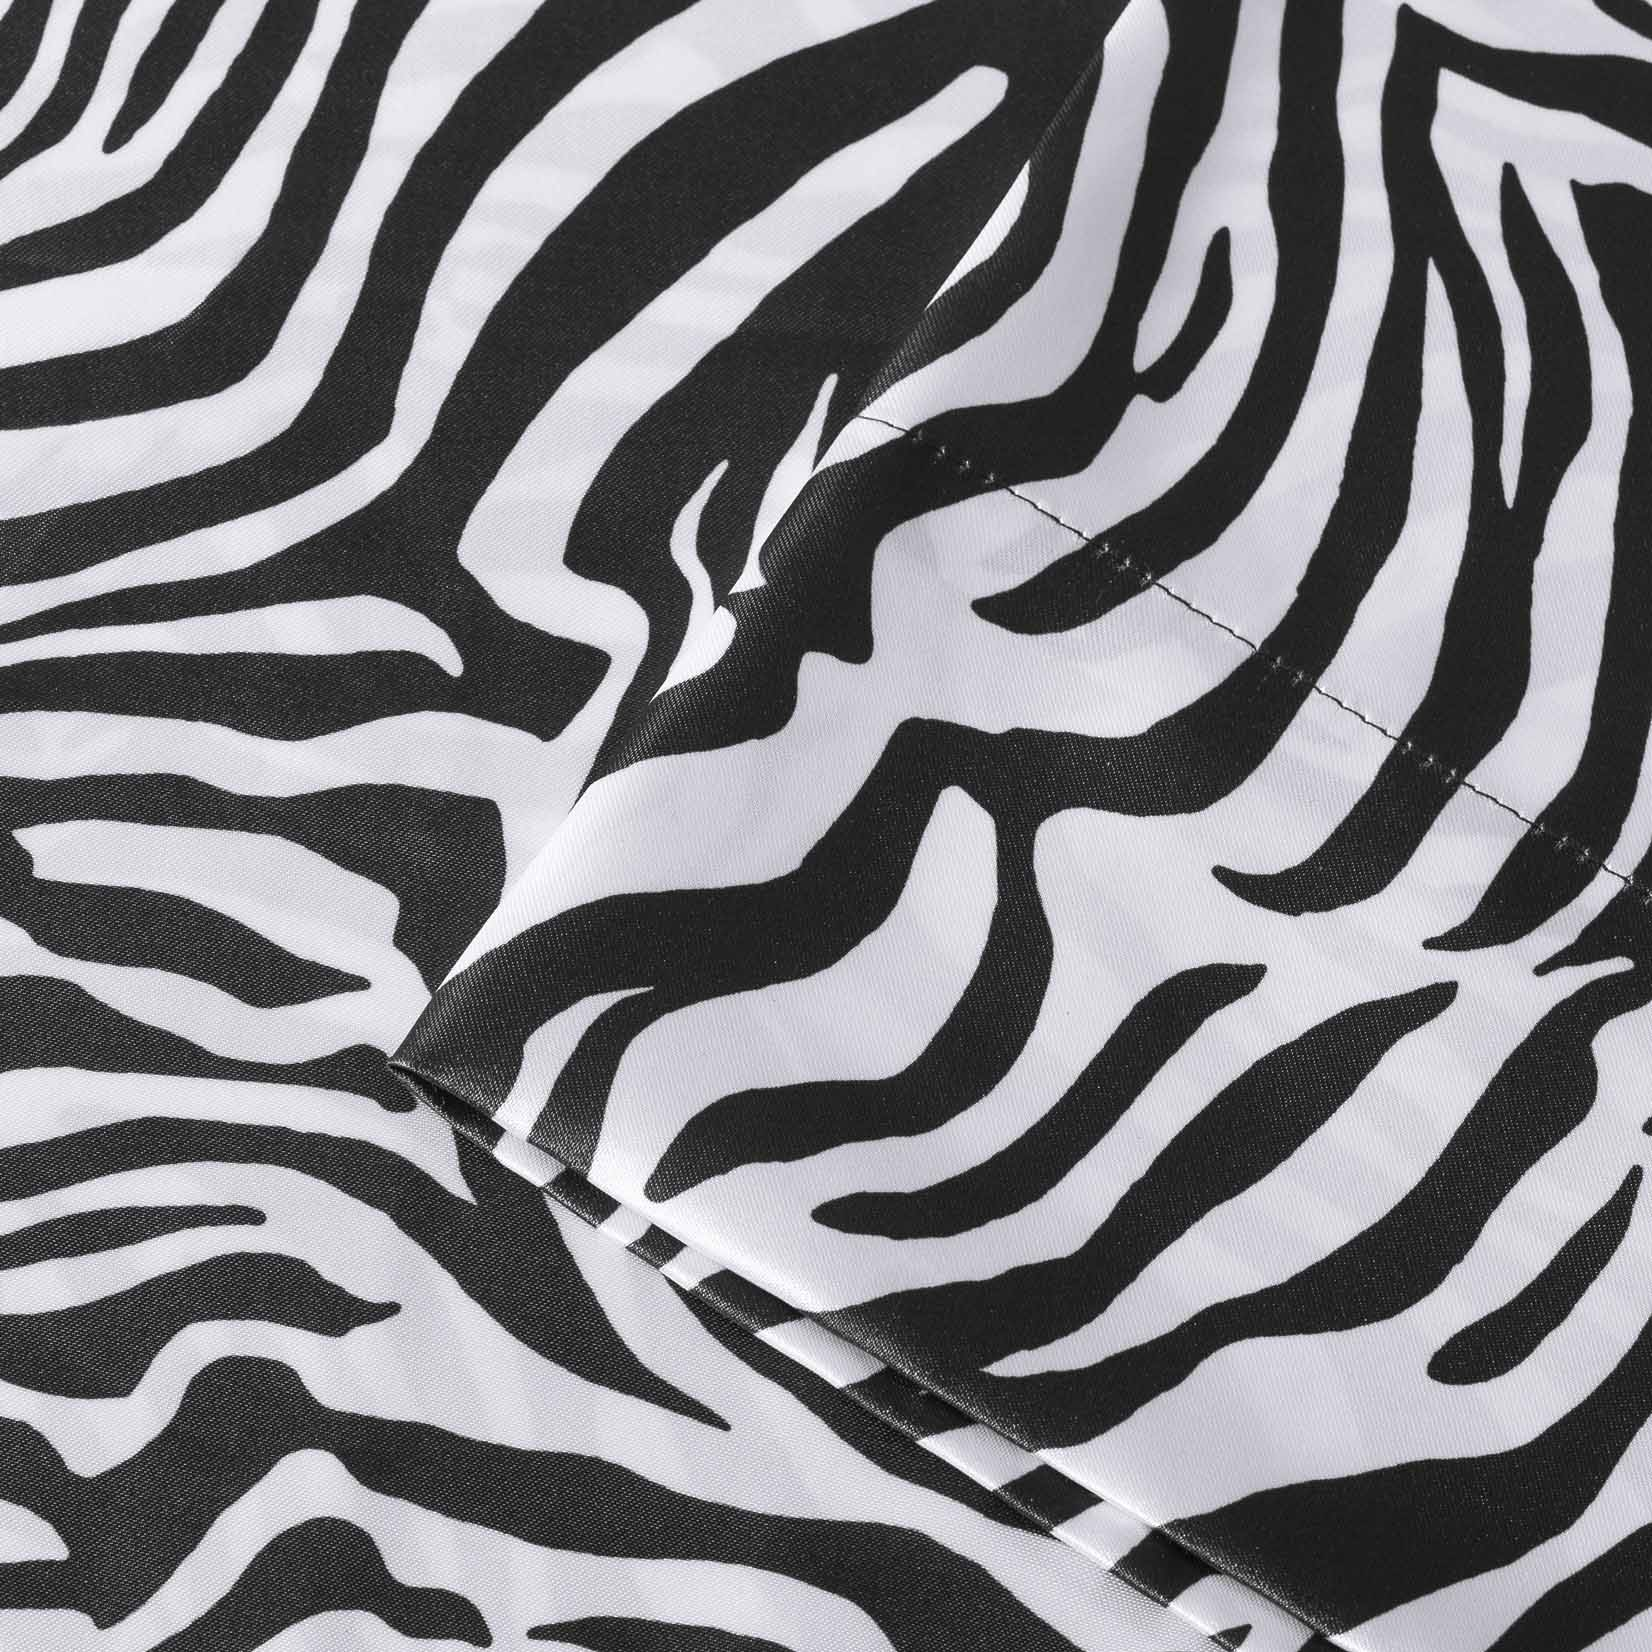 Premier Comfort Zebra Polyester Textured Satin Pillowcases (Set of 2)